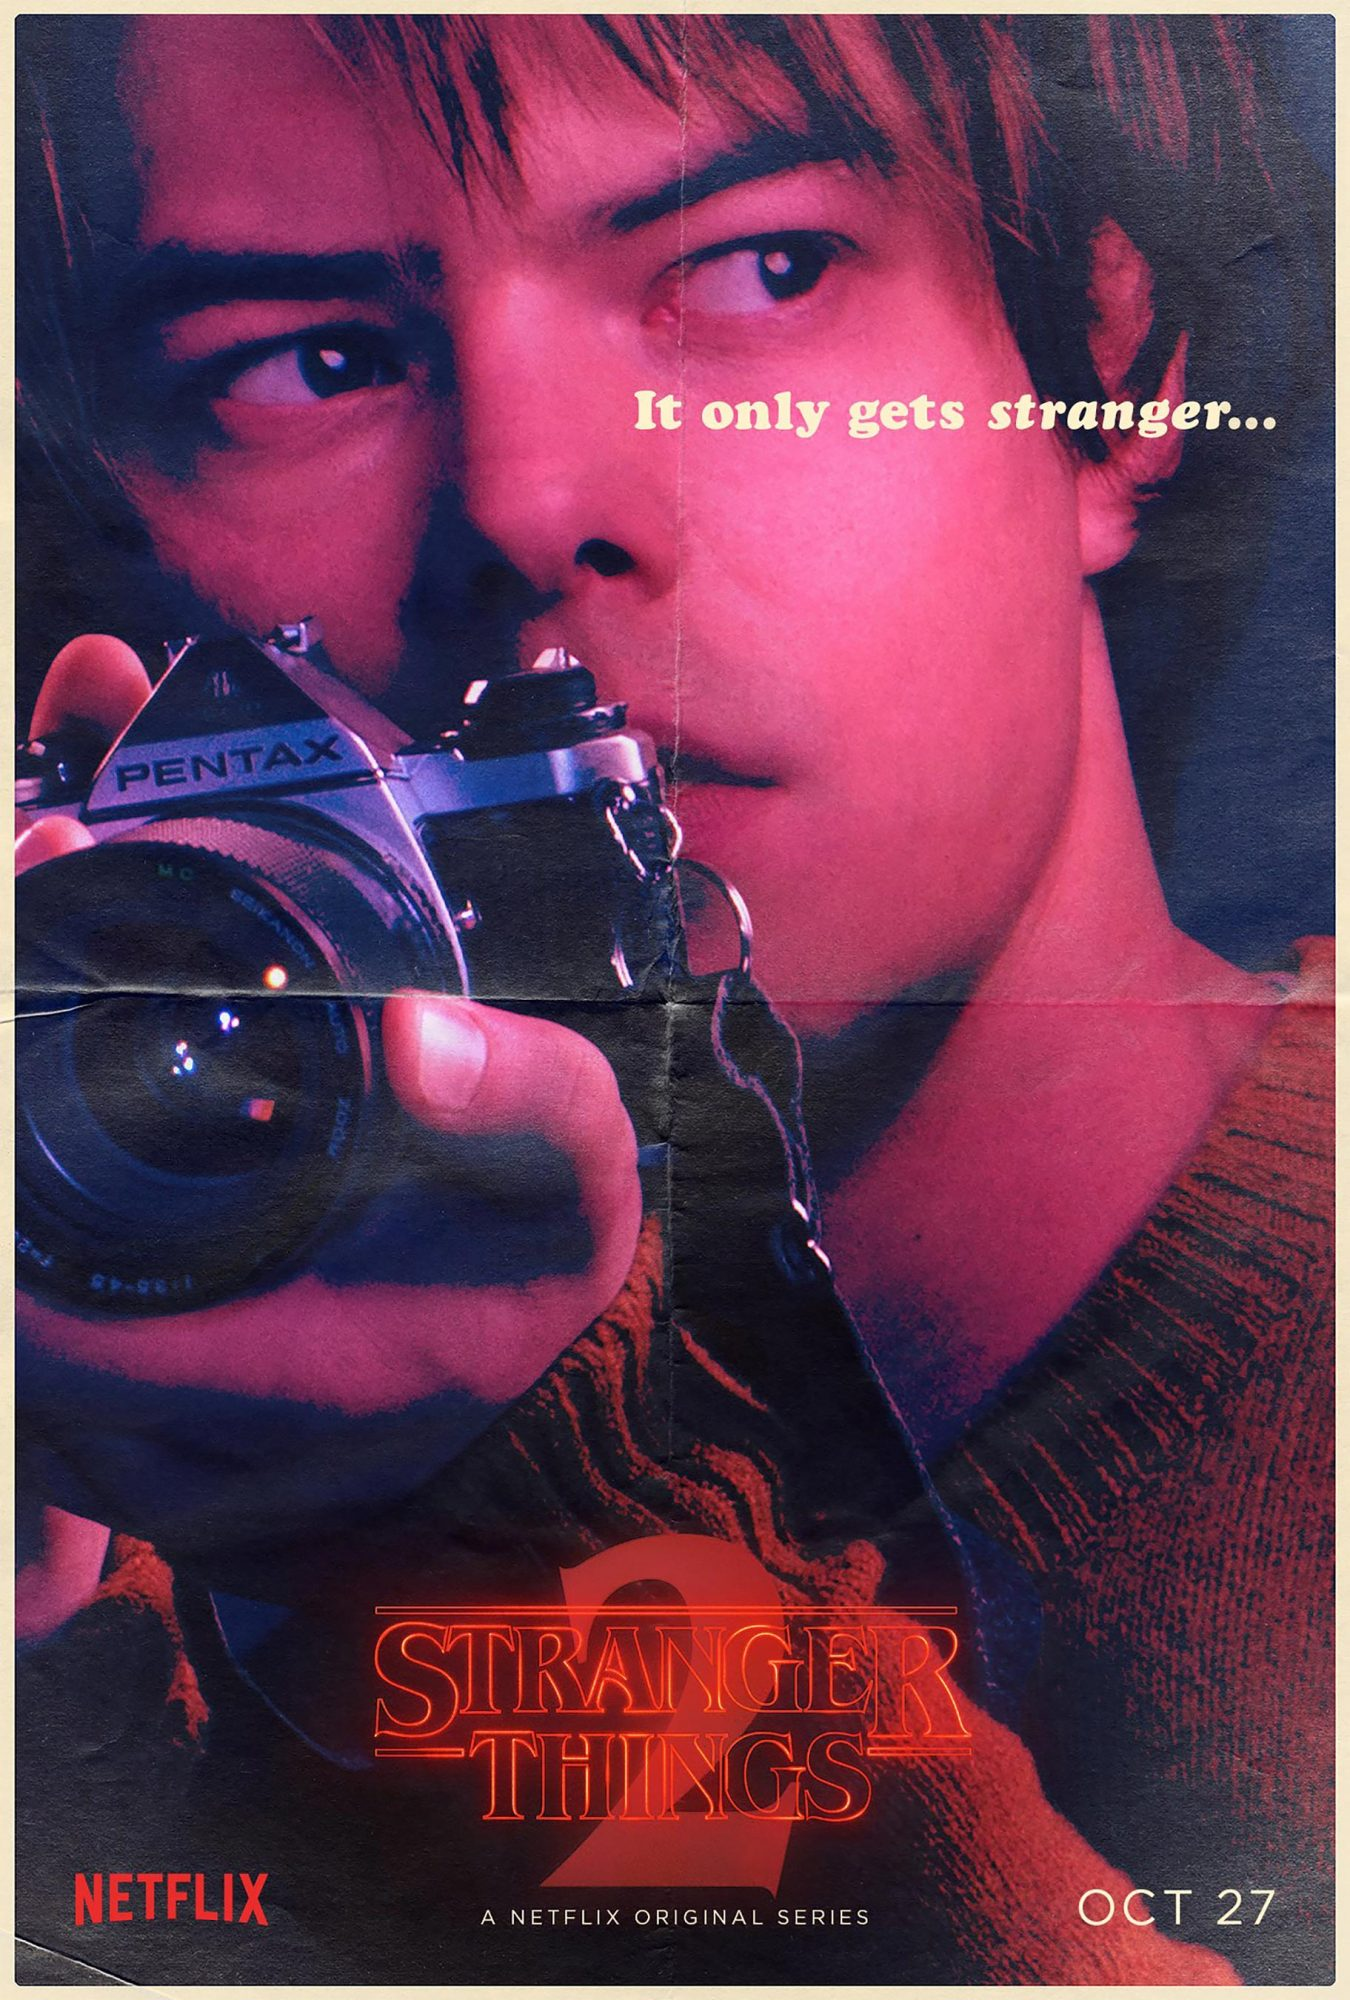 Stranger Things Season 2 - Charlie Heaton CR: Netflix